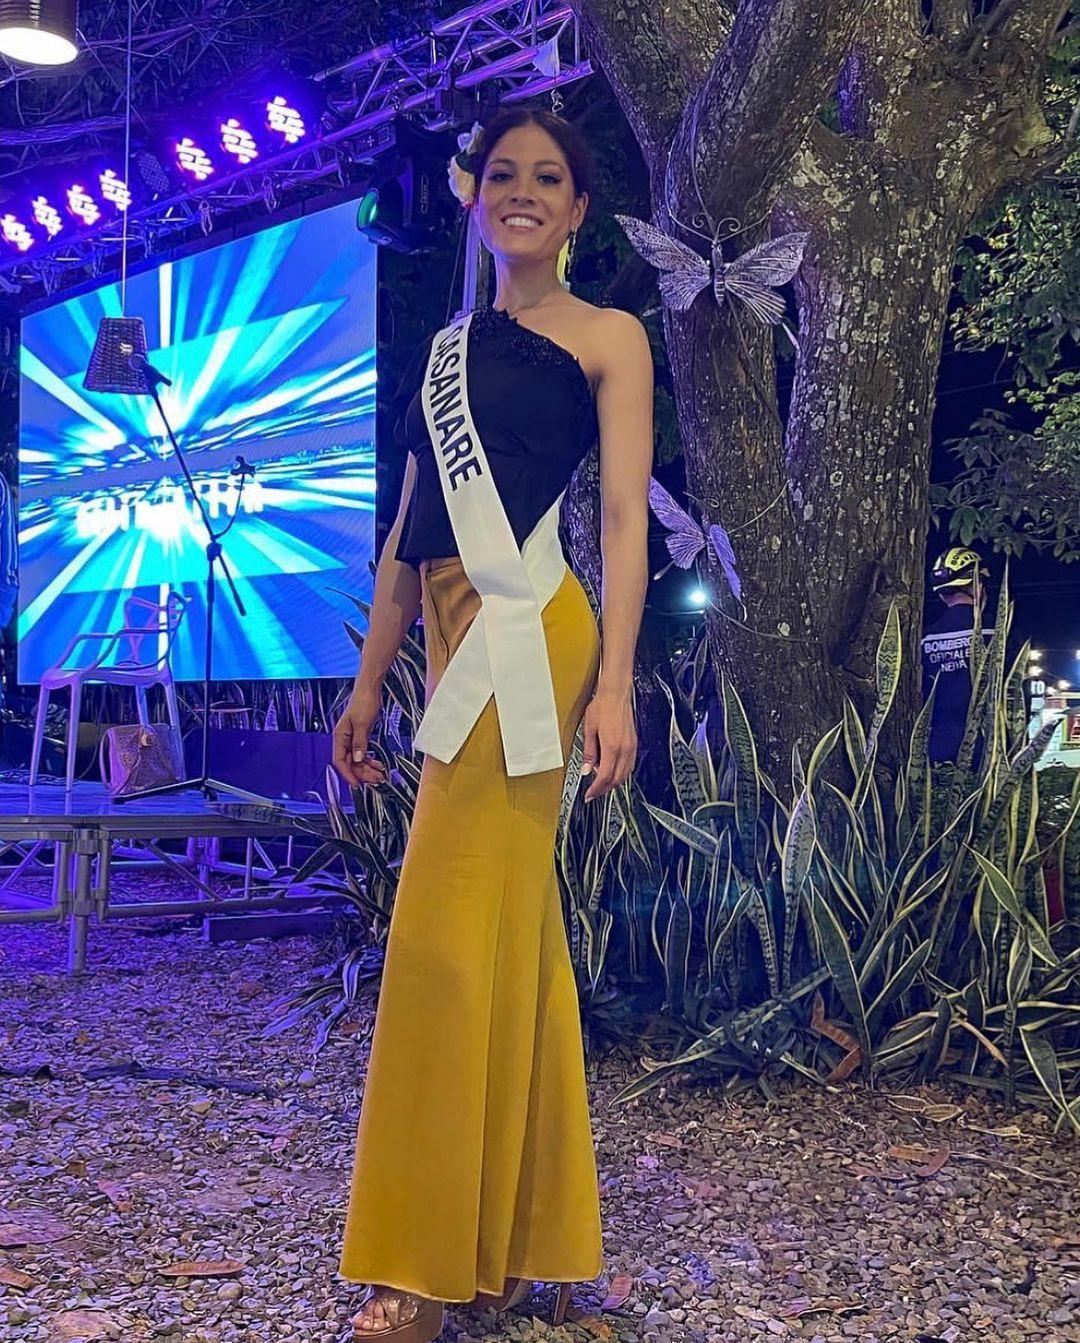 candidatas a miss universe colombia 2021. final: 18 oct. sede: neiva. - Página 5 52SvwB